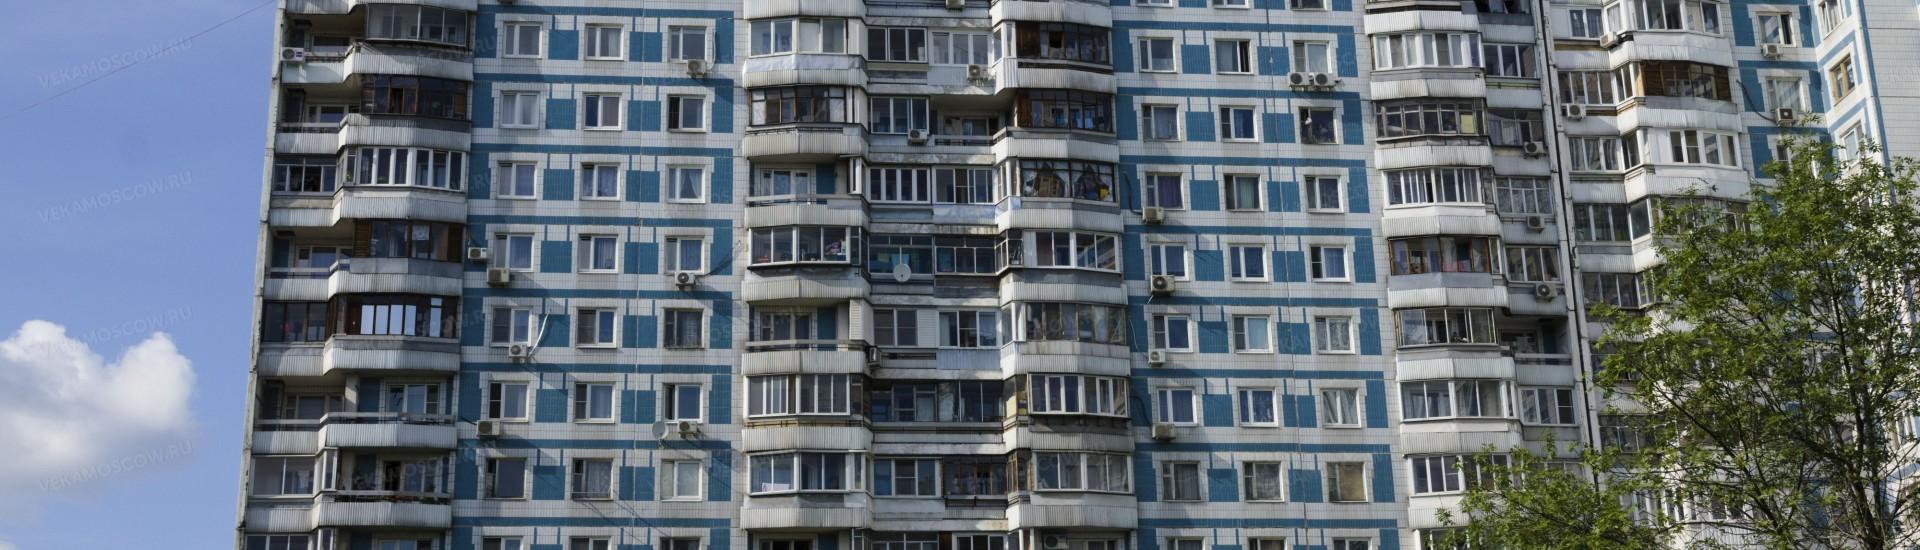 Дизайн 3-х комнатной квартиры п-44т » Современный дизайн на Vip-1gl.ru | 550x1920